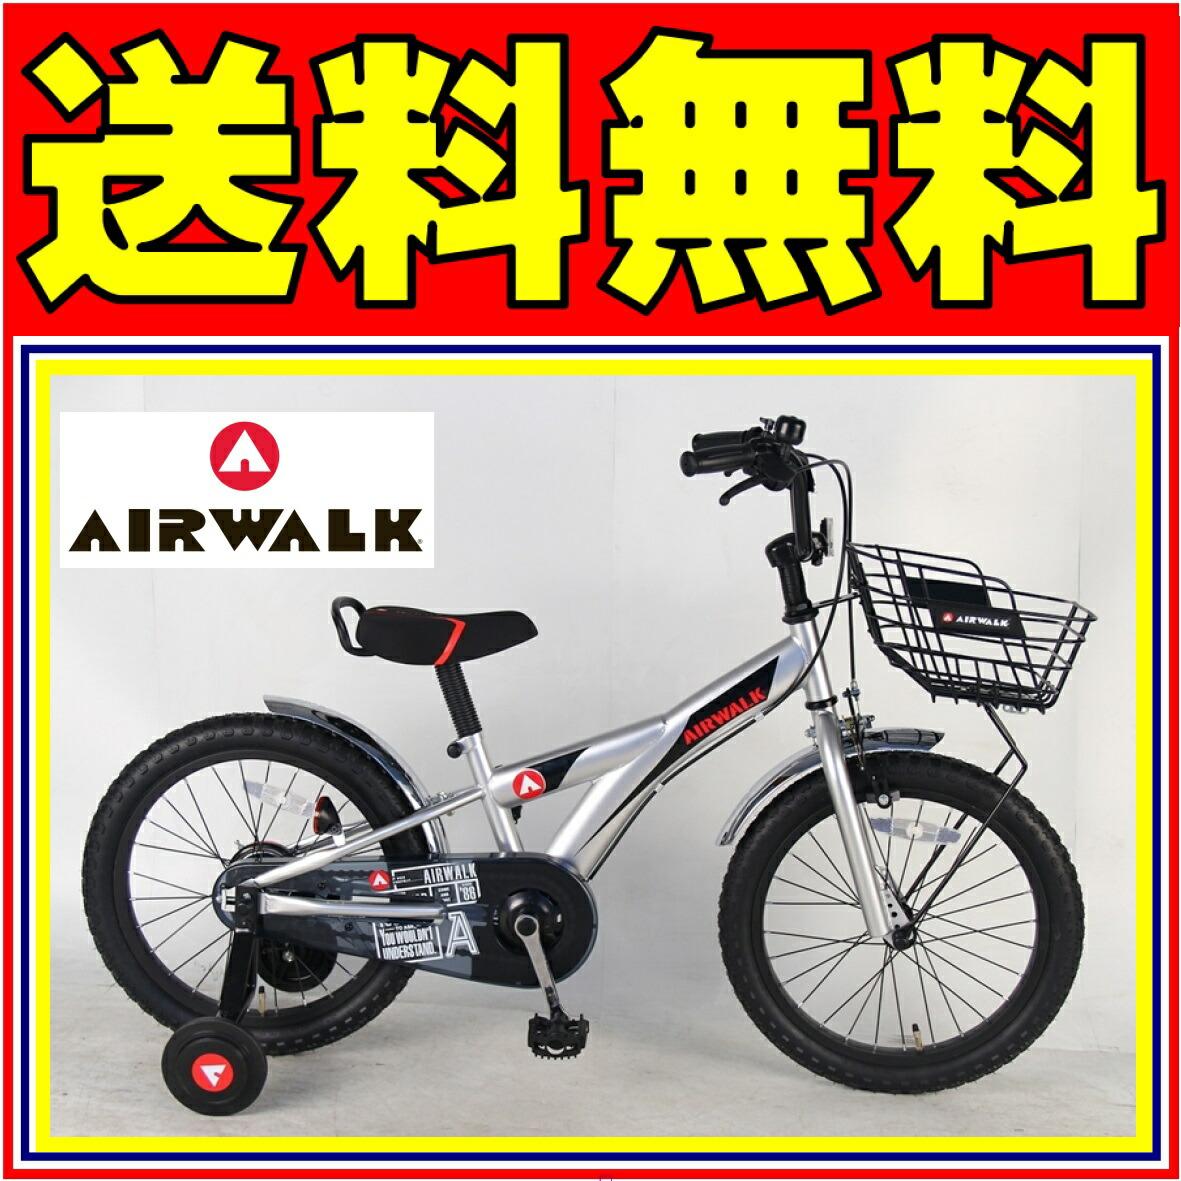 AIRWALK 自転車 子供車 マウンテンバイク ホワイト 白 子供用、男子小学生に最適 MTB 子供車 16インチ マウンテンバイク AIRWALK エアーウォーク 自転車キッズ 自転車 ジュニア